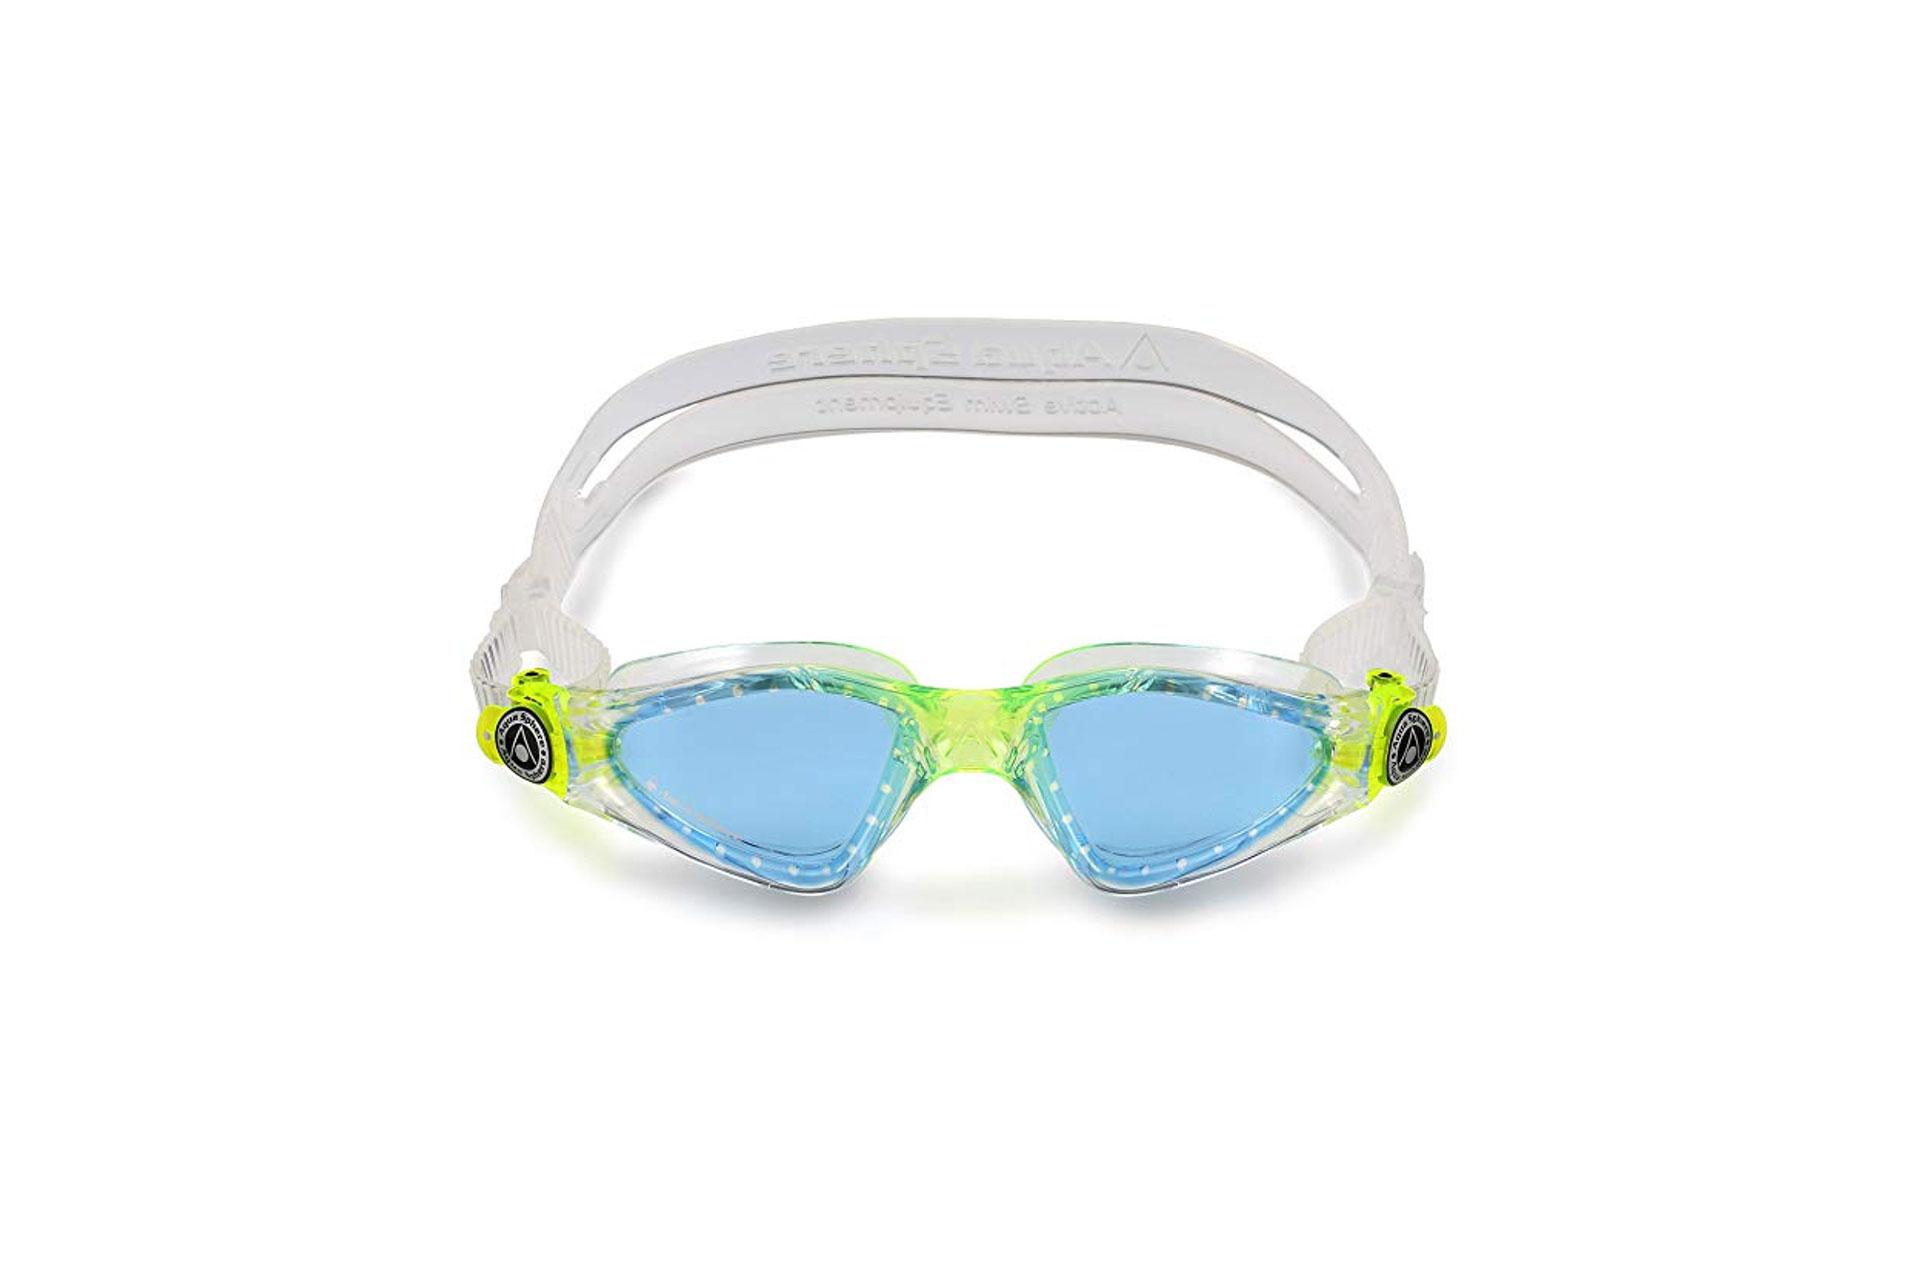 Aqua Sphere Goggles; Courtesy of Amazon